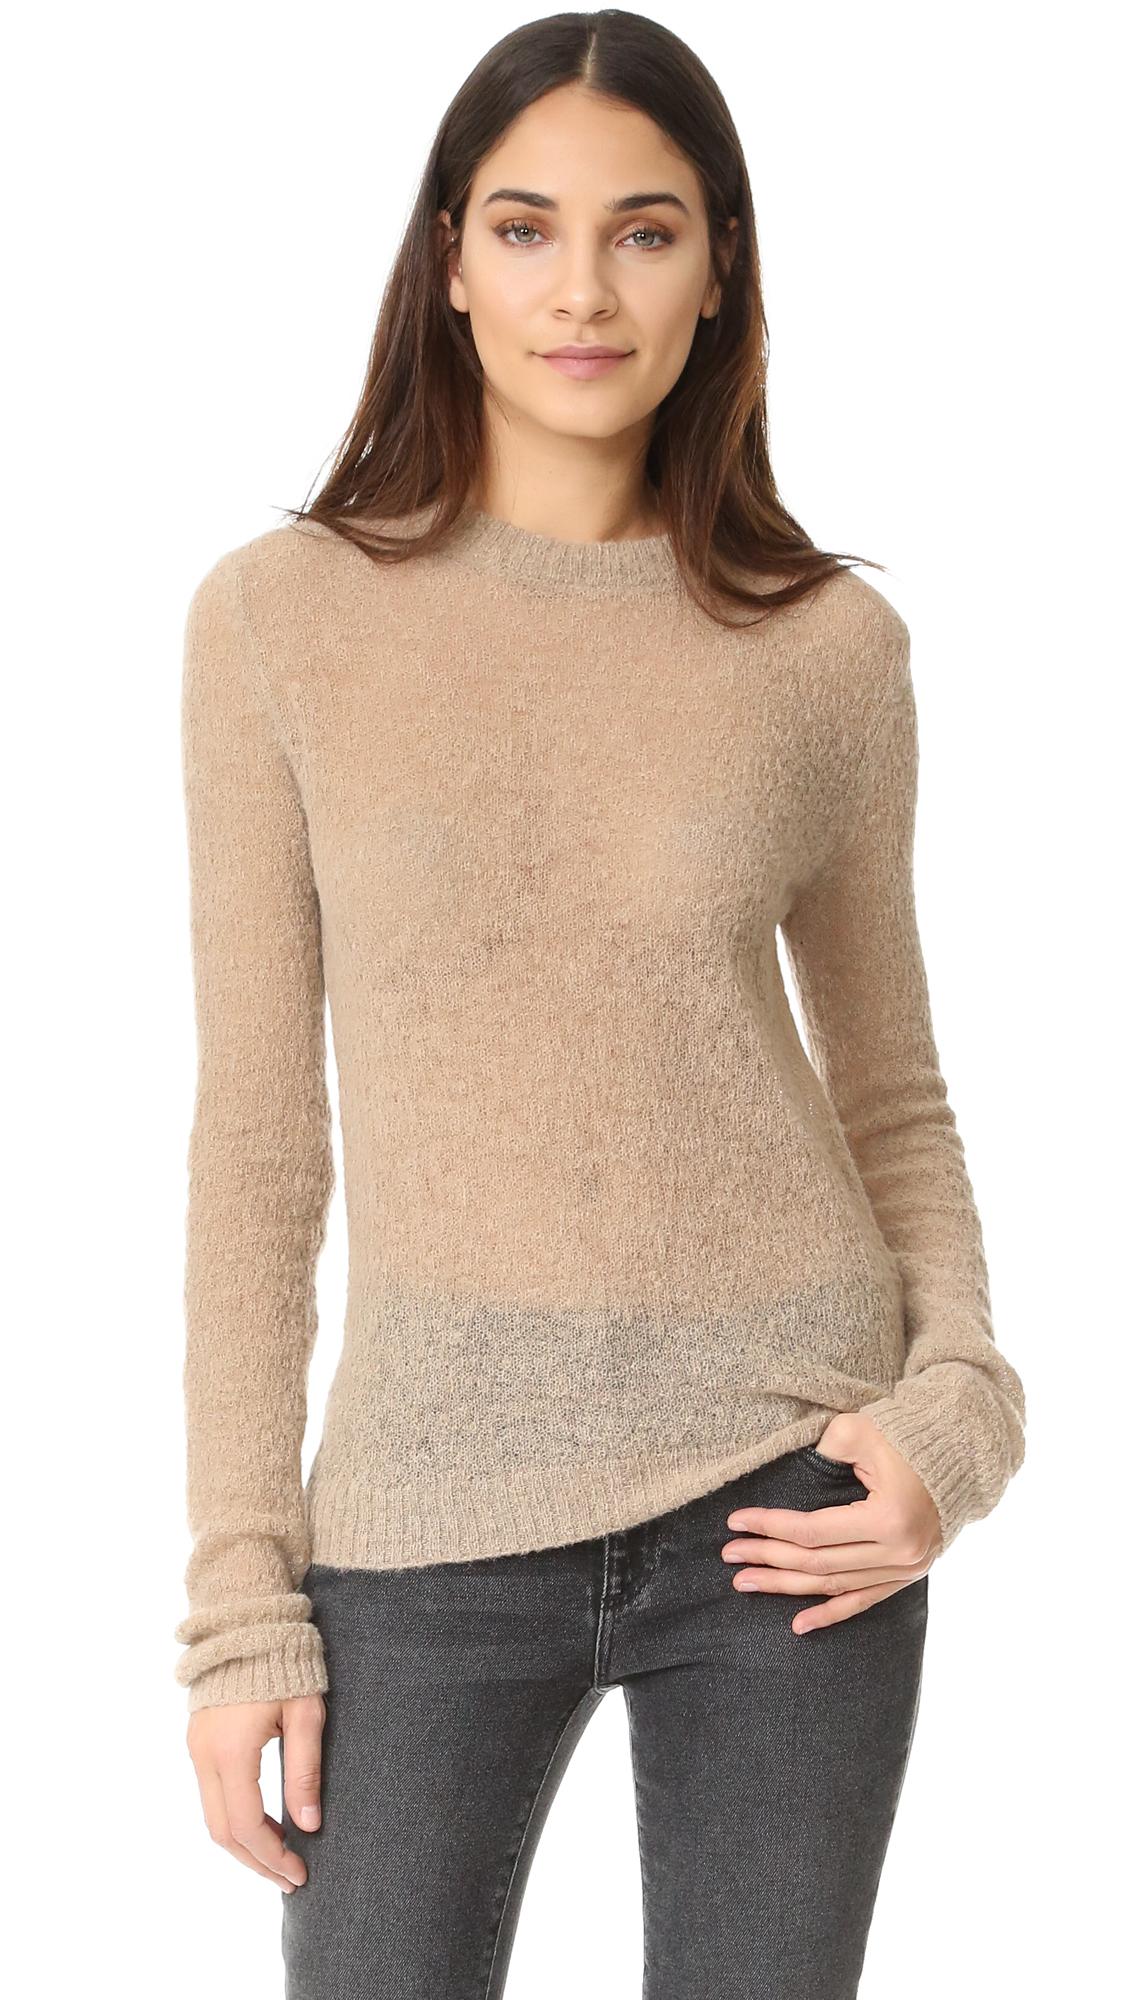 Acne Studios Trixie Alpaca Sweater - Sand Beige at Shopbop